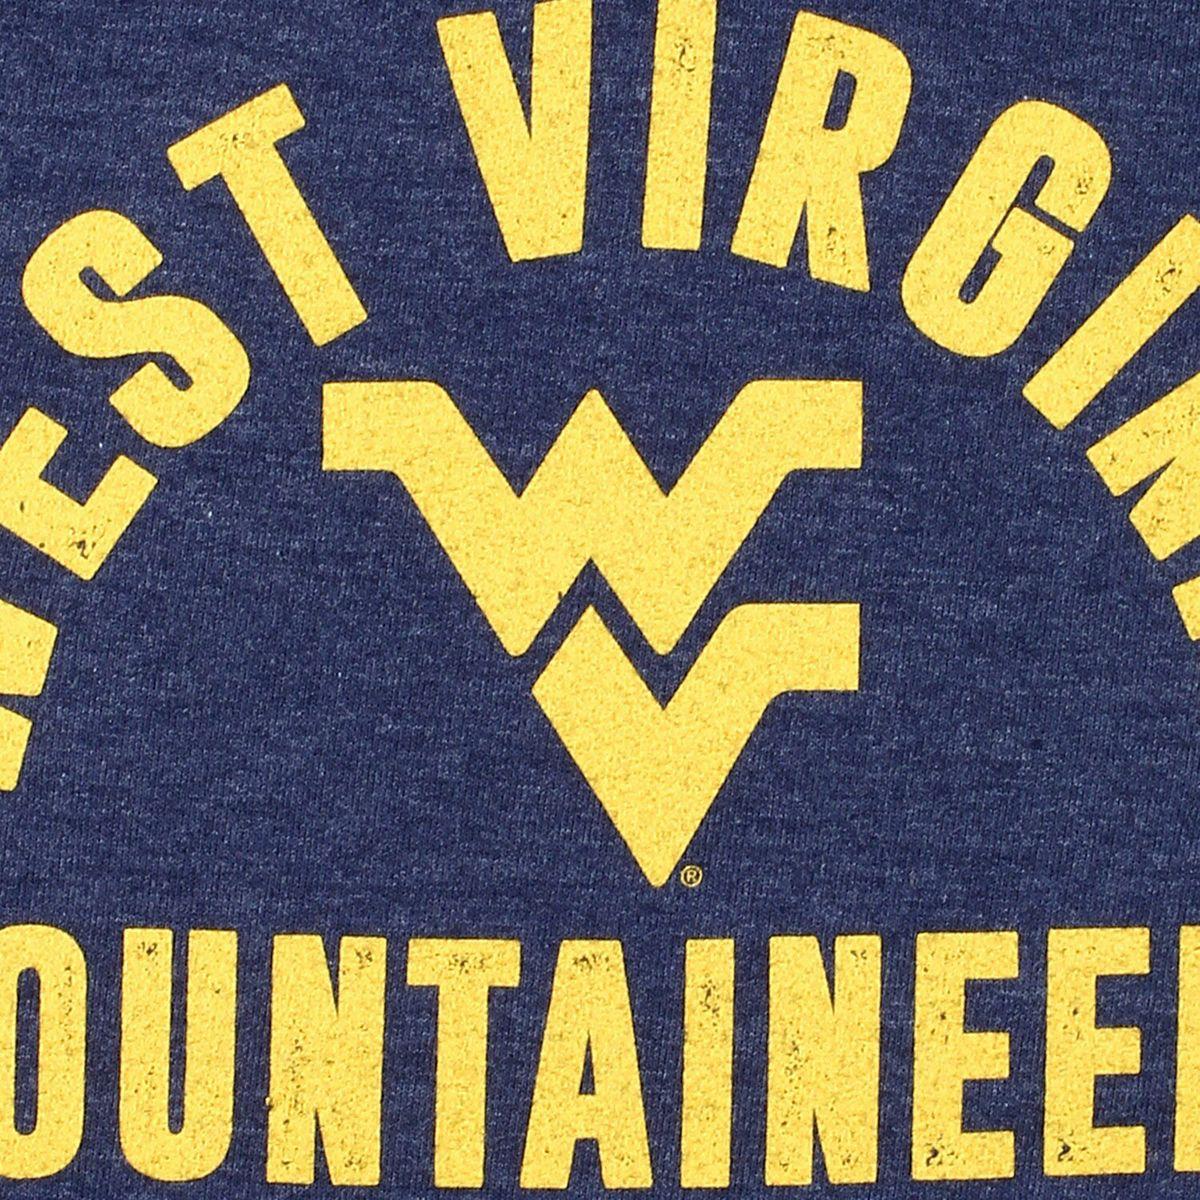 Women's Original Retro Brand Navy West Virginia Mountaineers Funnel Neck Pullover Sweatshirt 1RAVi